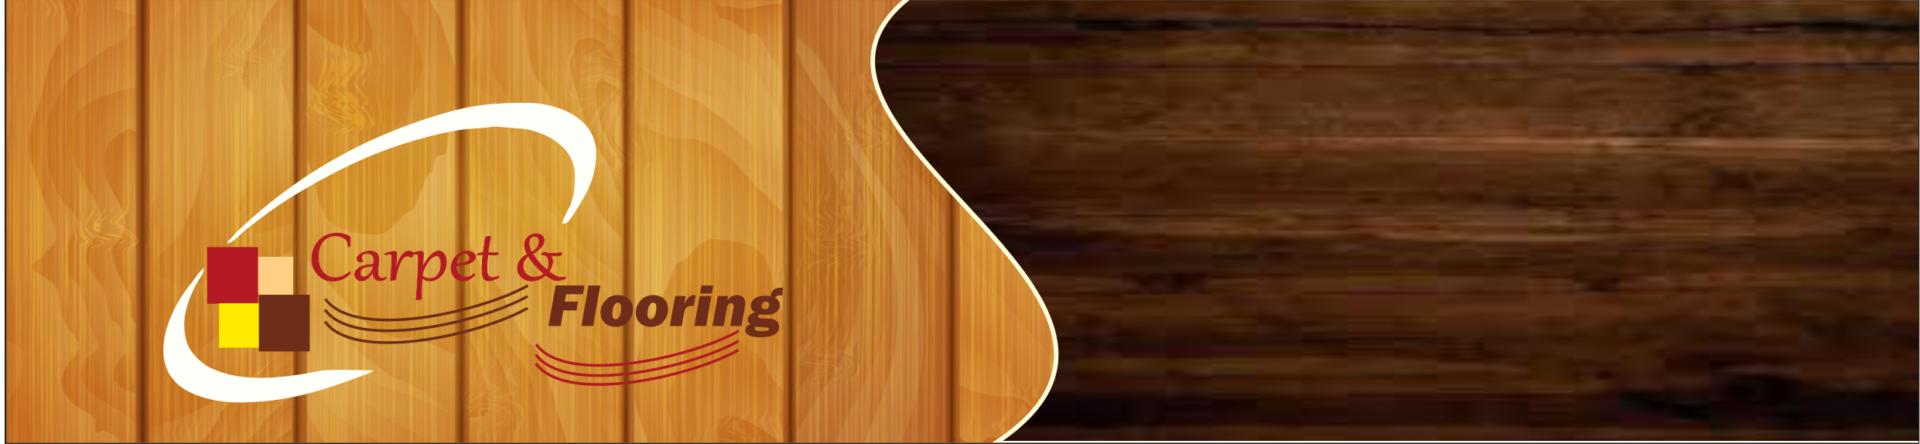 Wallpaper Suppliers In Mumbai 9324384072 In 2020 Wallpaper Suppliers Pvc Flooring Carpet Flooring